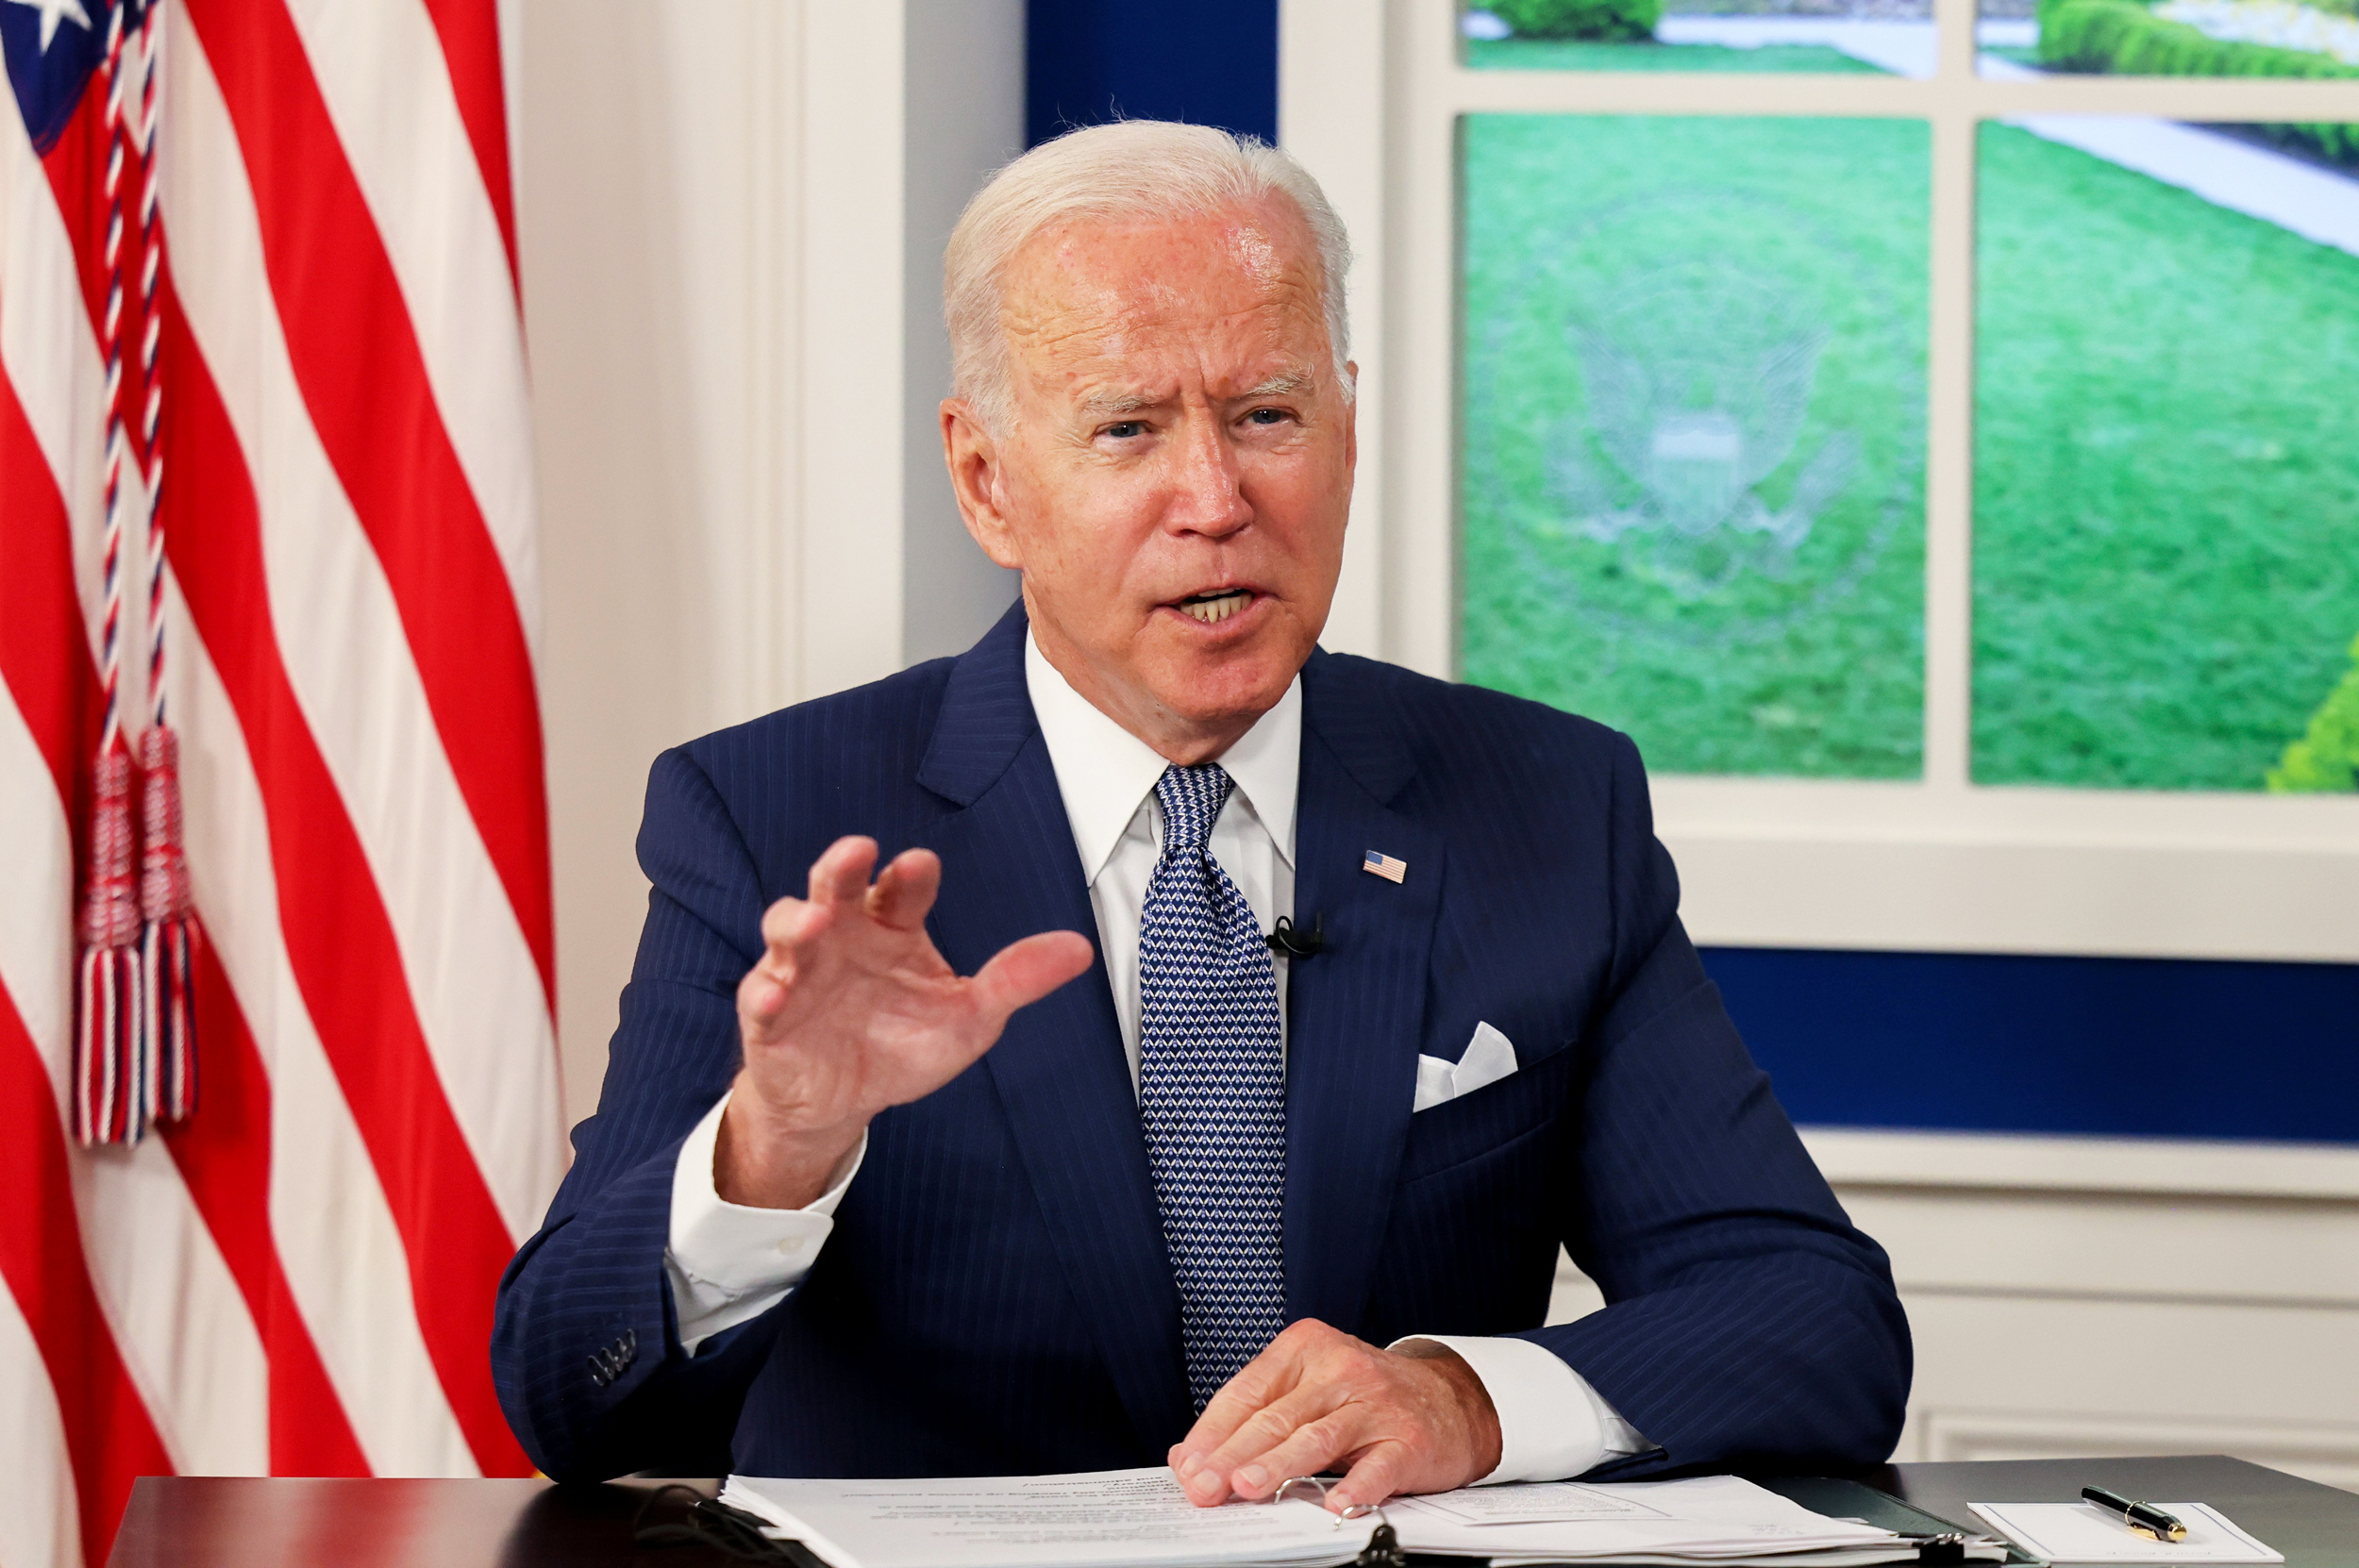 Biden faces pressure to break Democratic impasse